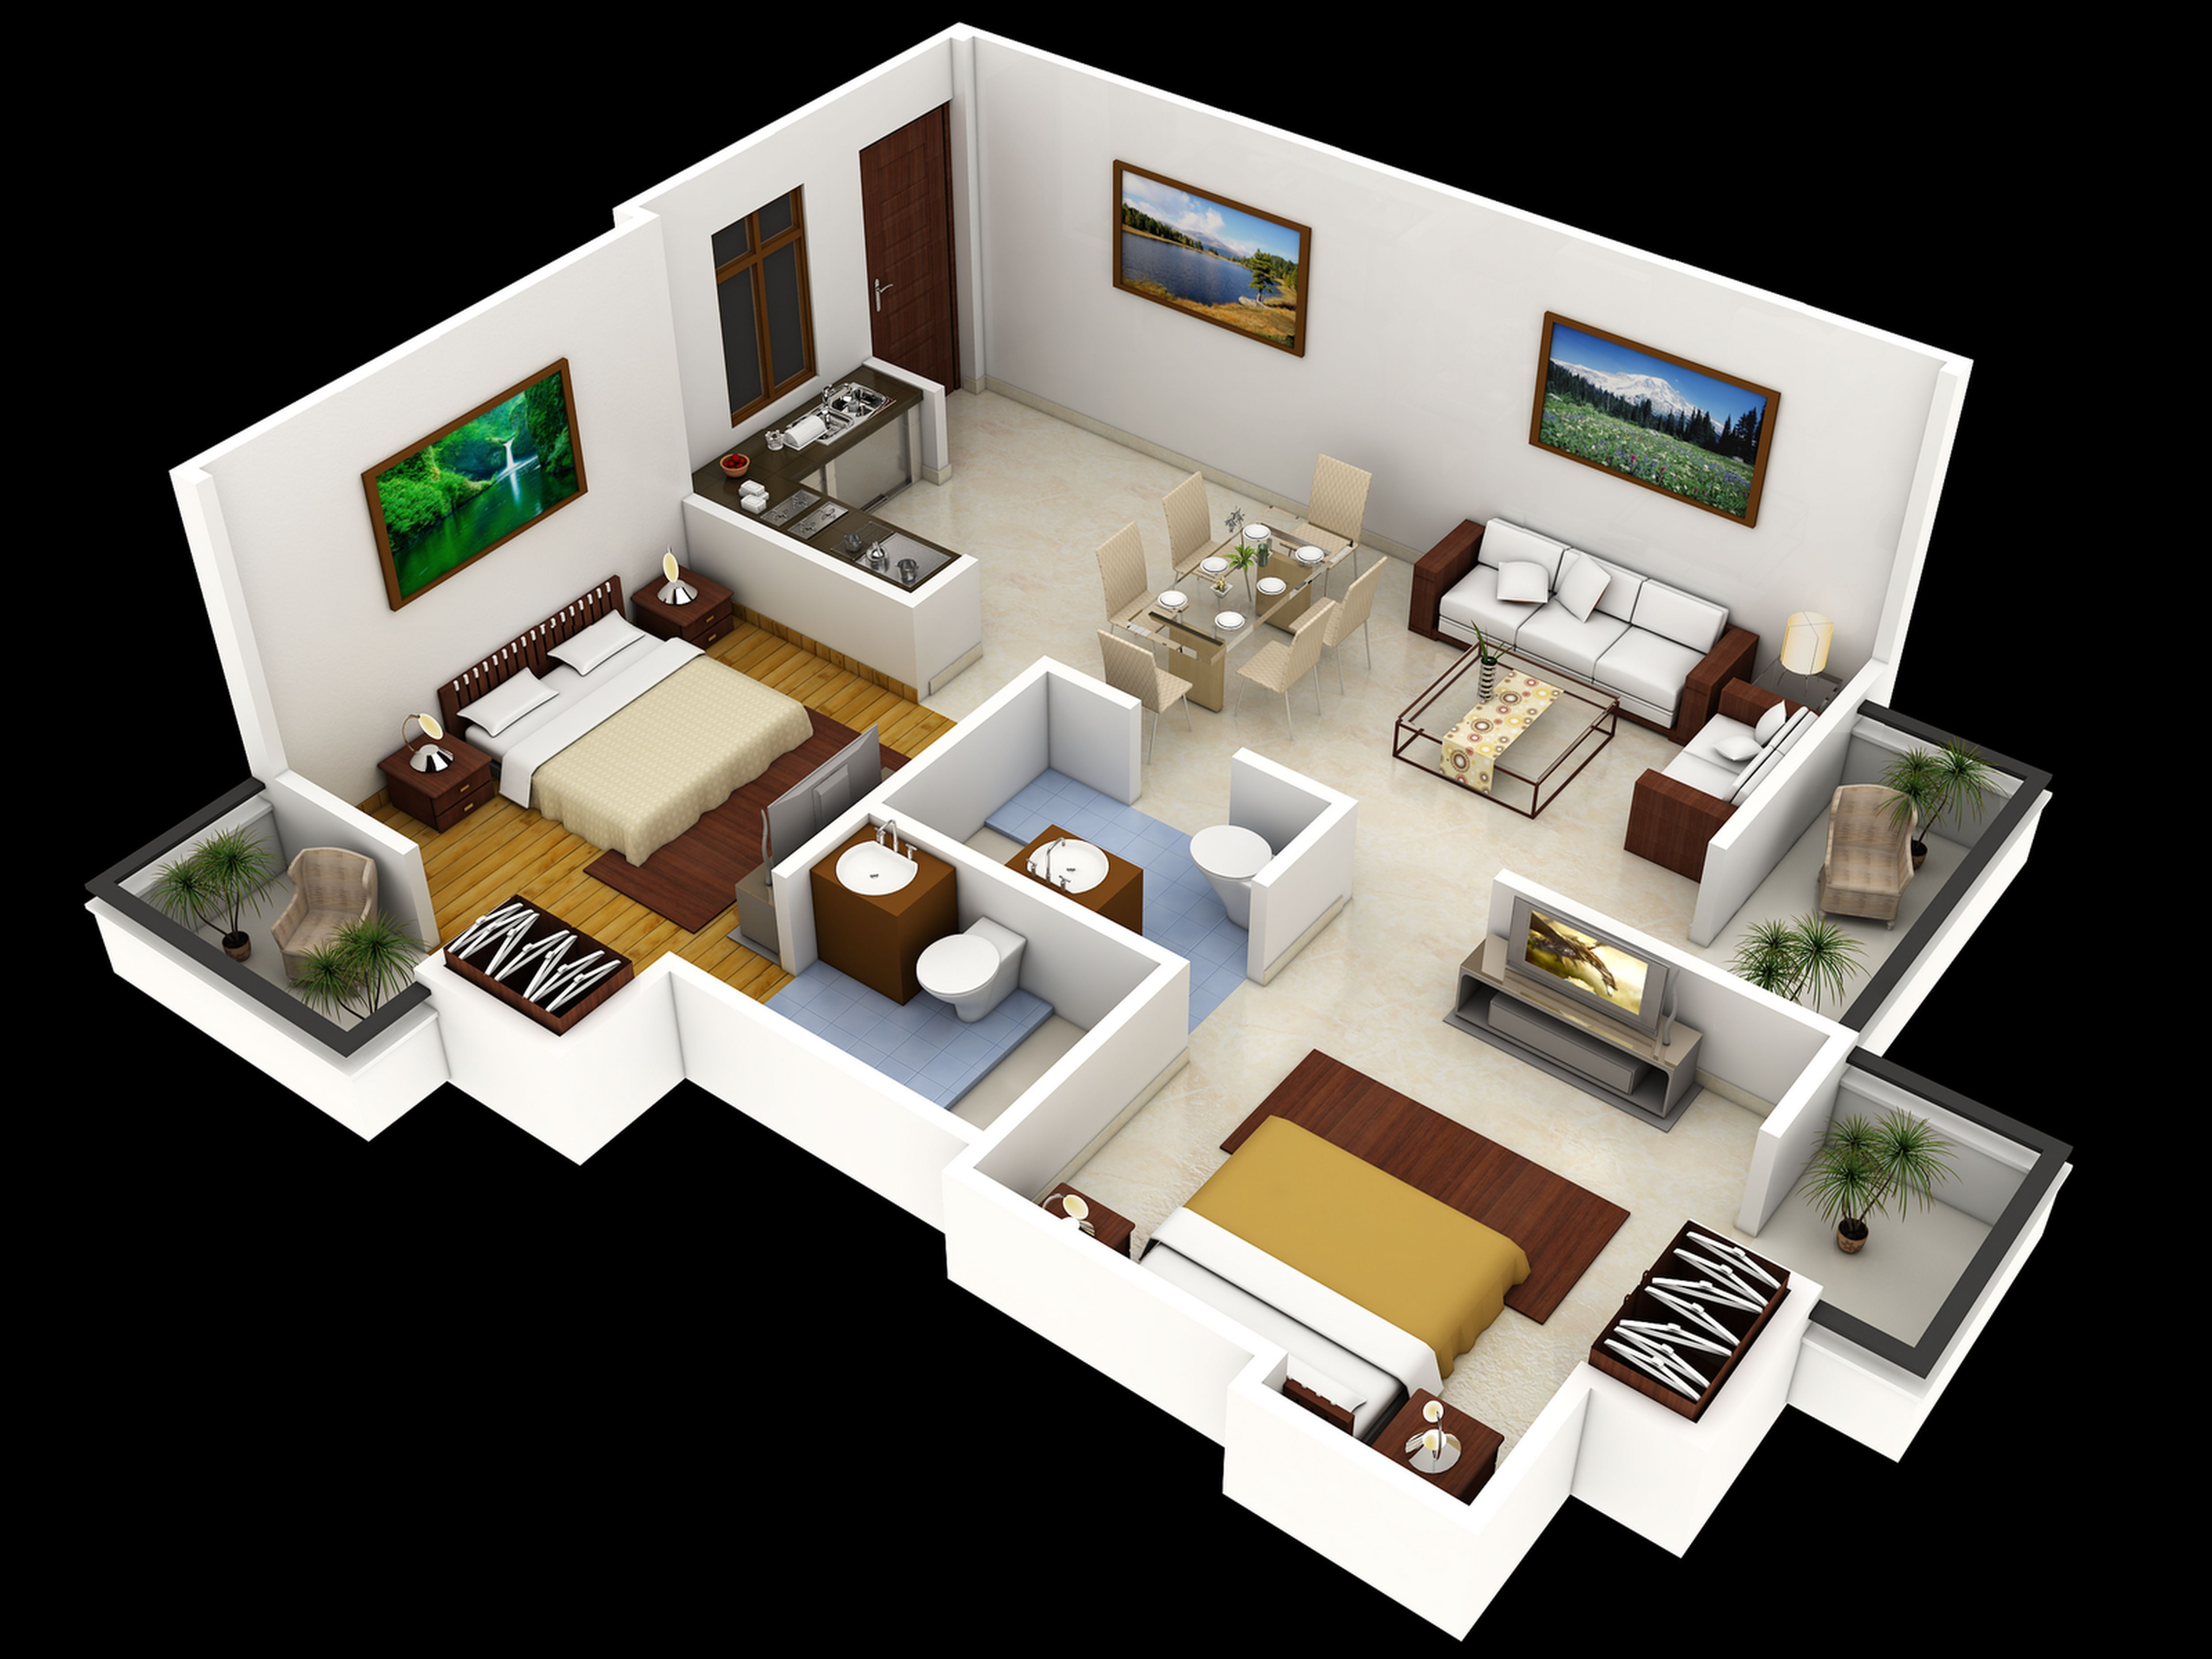 Bedroom Design Tool Online Free House Plans Online Free Plan D